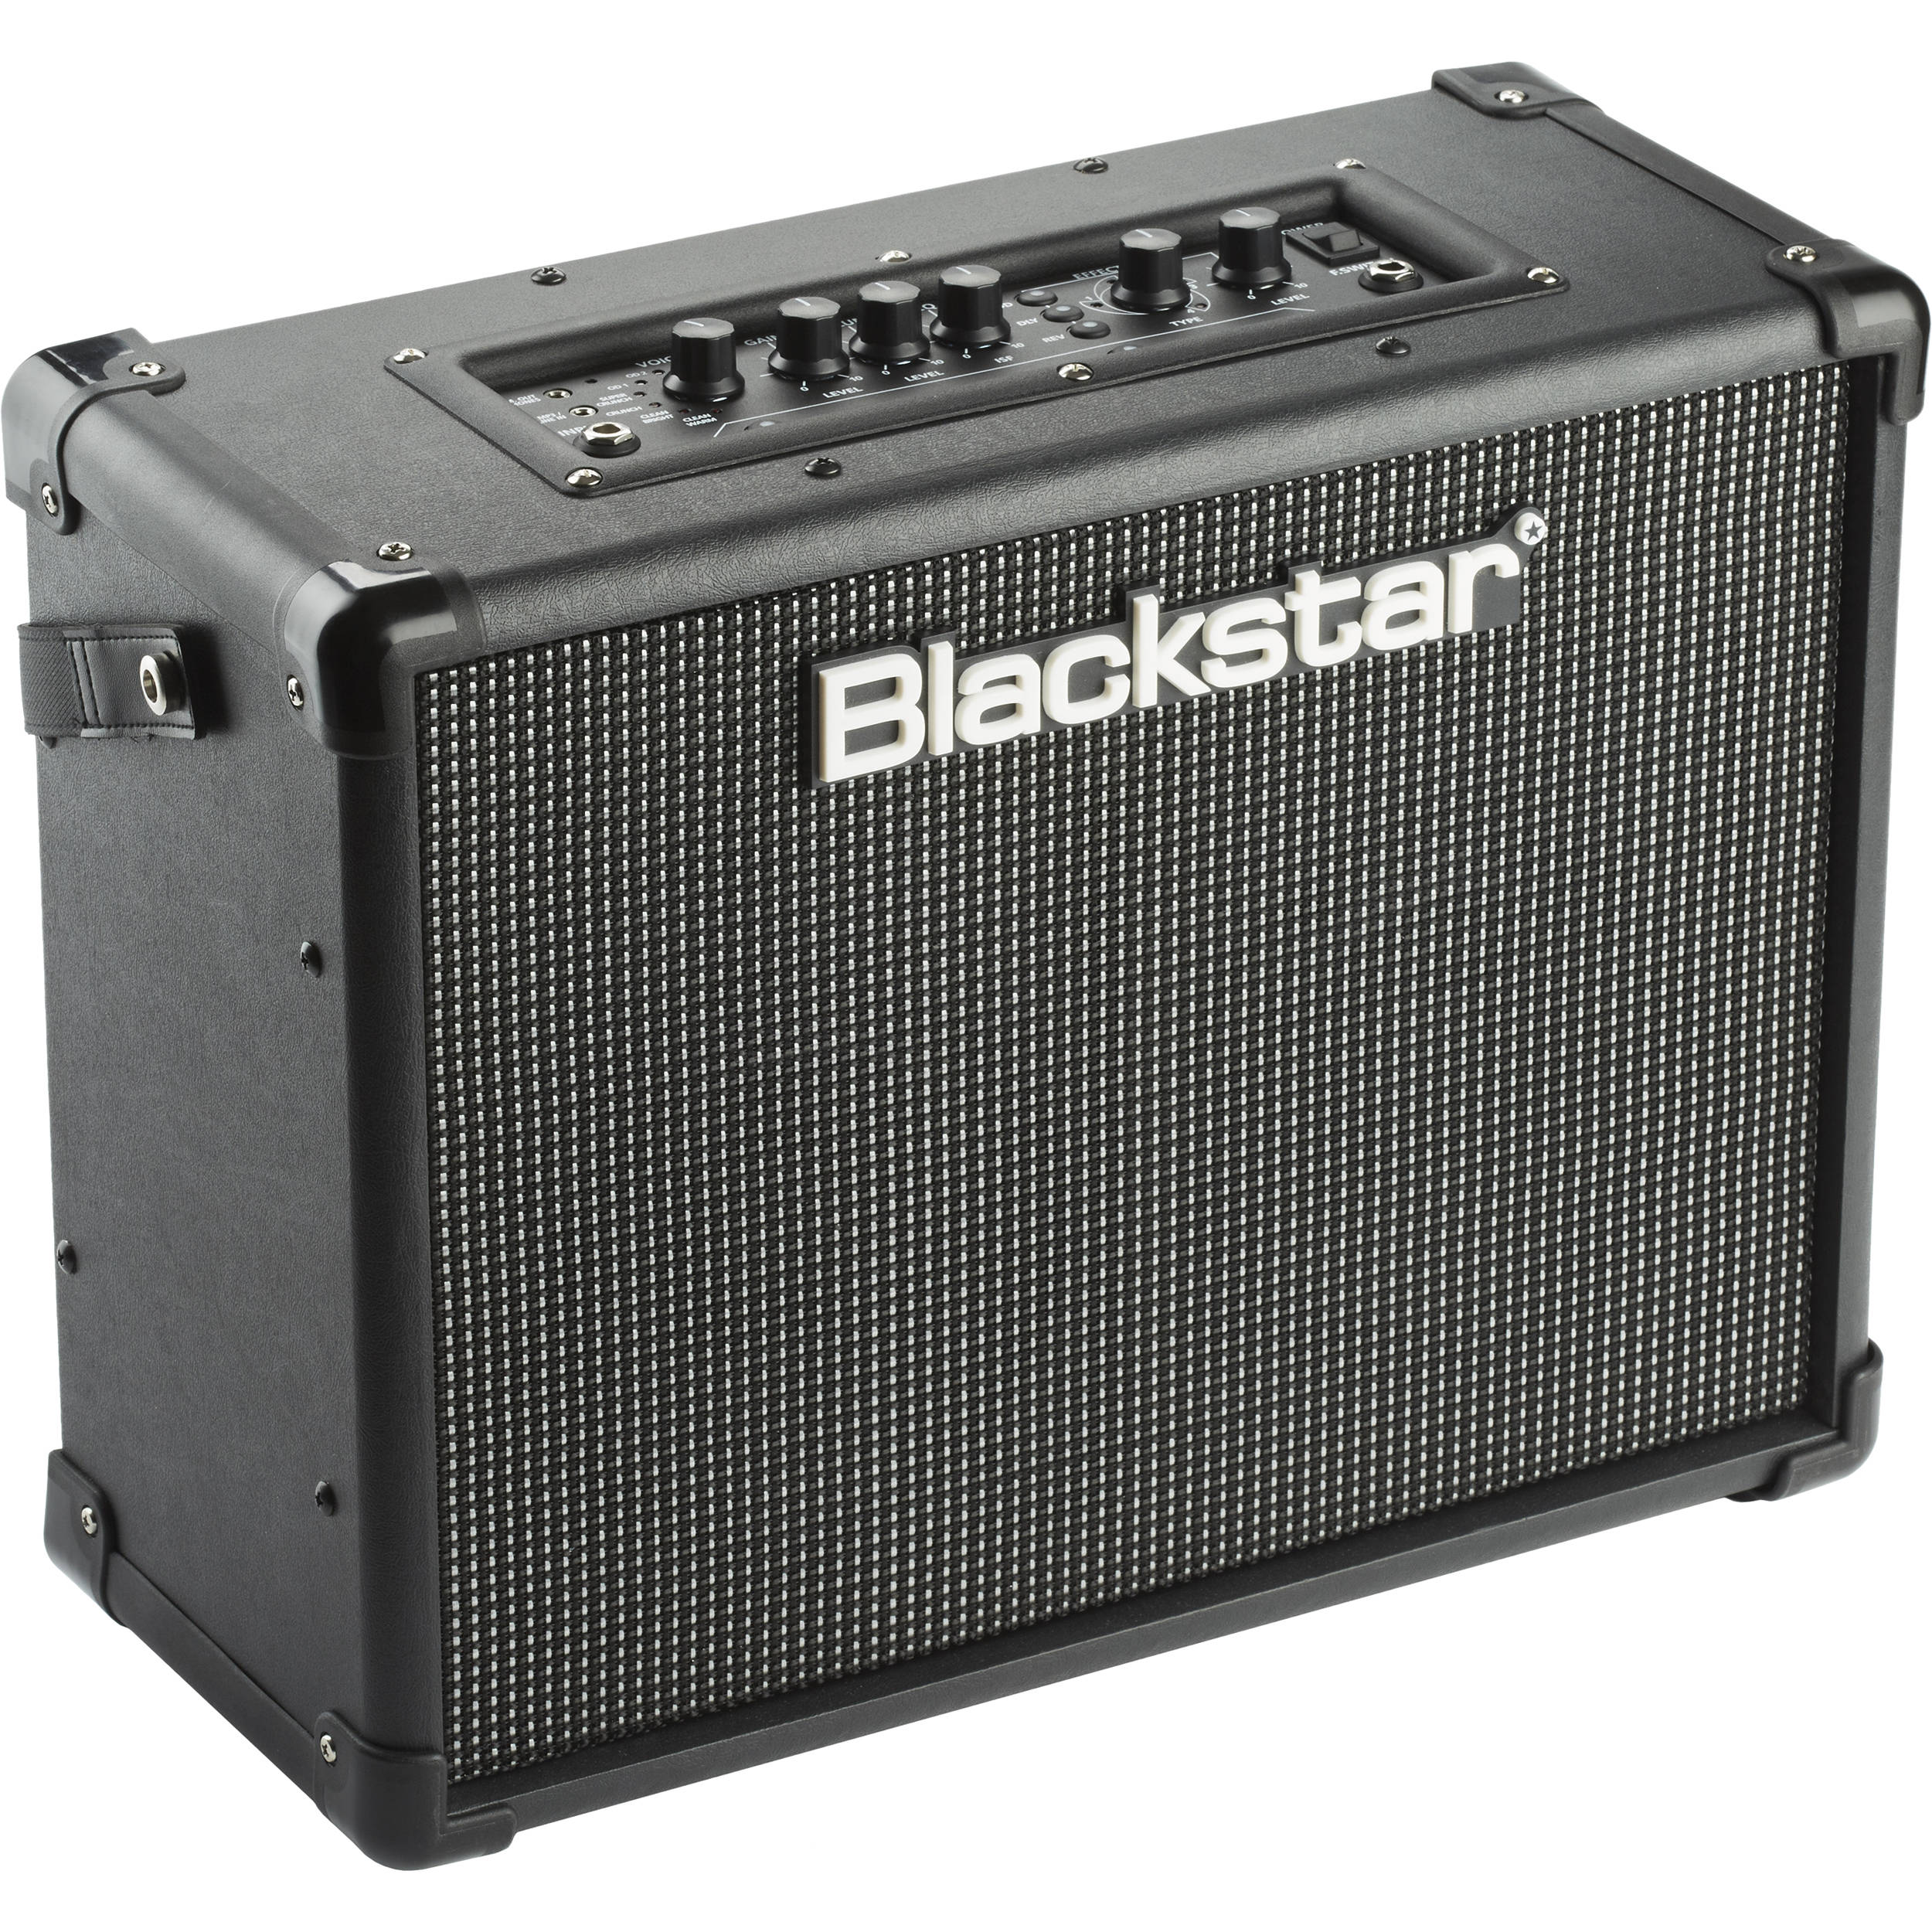 blackstar id core stereo 40 2x 20w super wide stereo idcore40. Black Bedroom Furniture Sets. Home Design Ideas